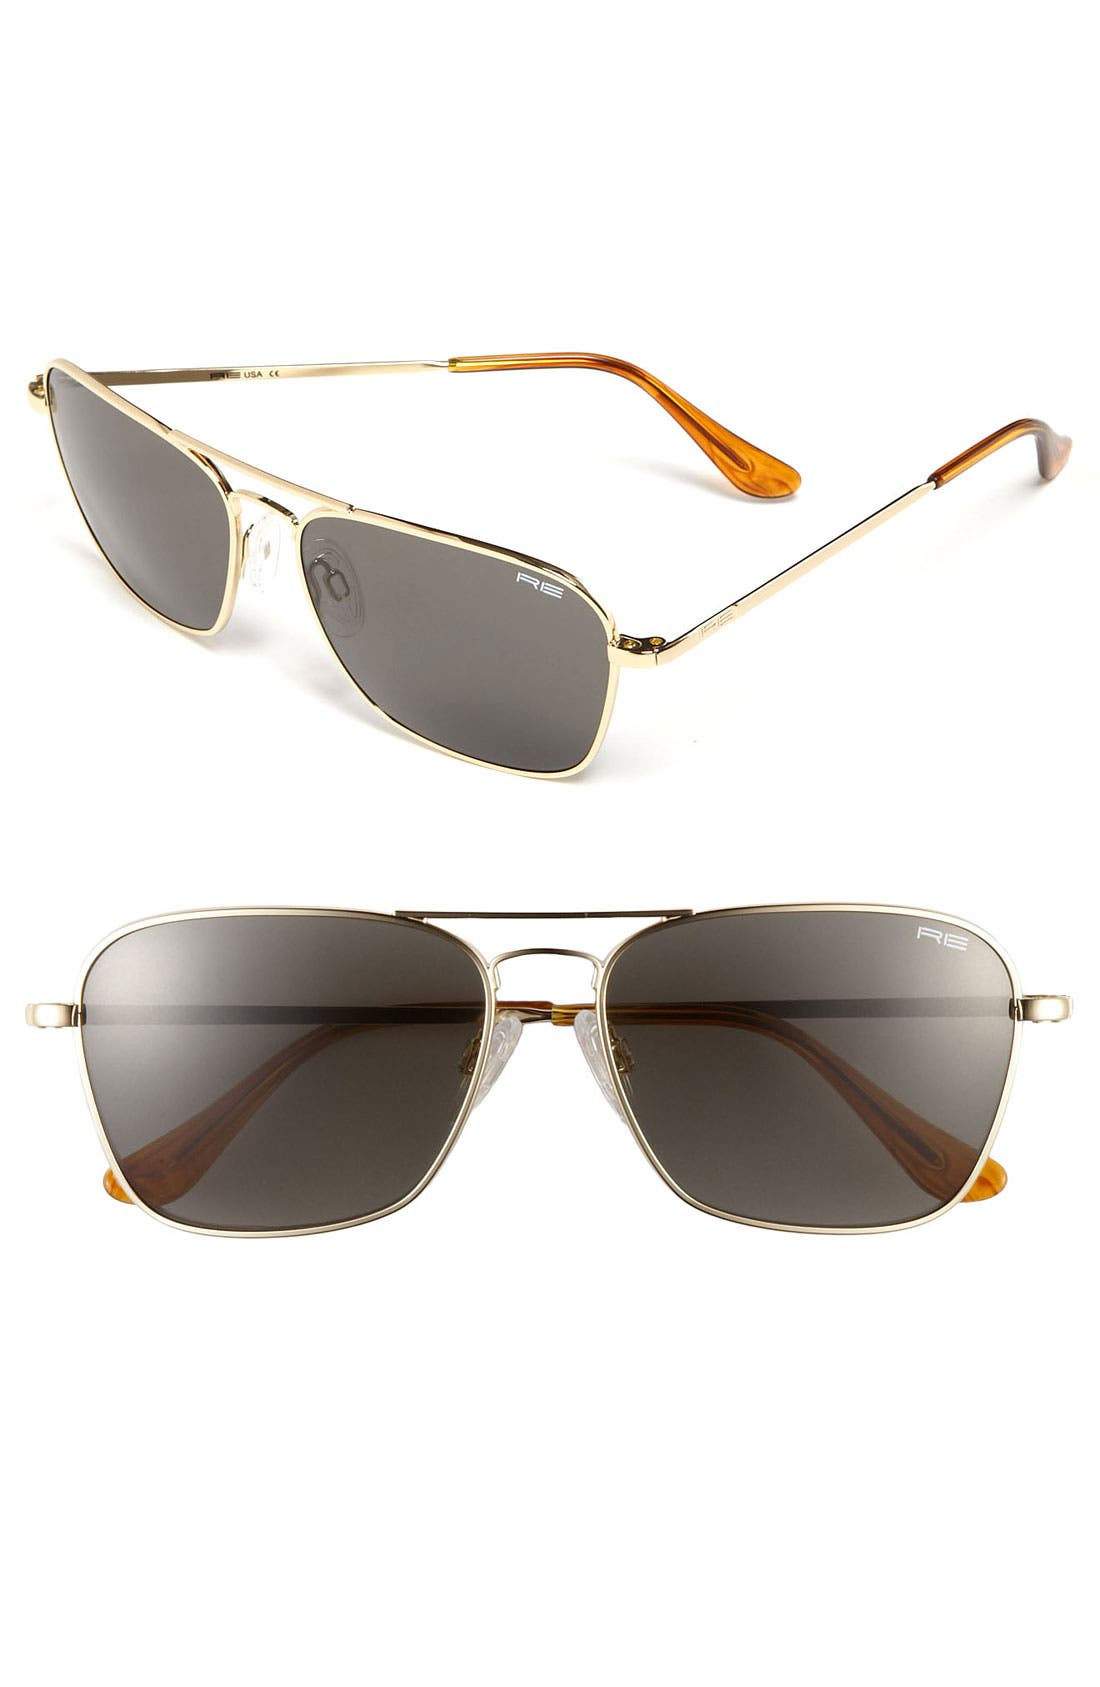 Main Image - Randolph Engineering 'Intruder' 58mm Sunglasses